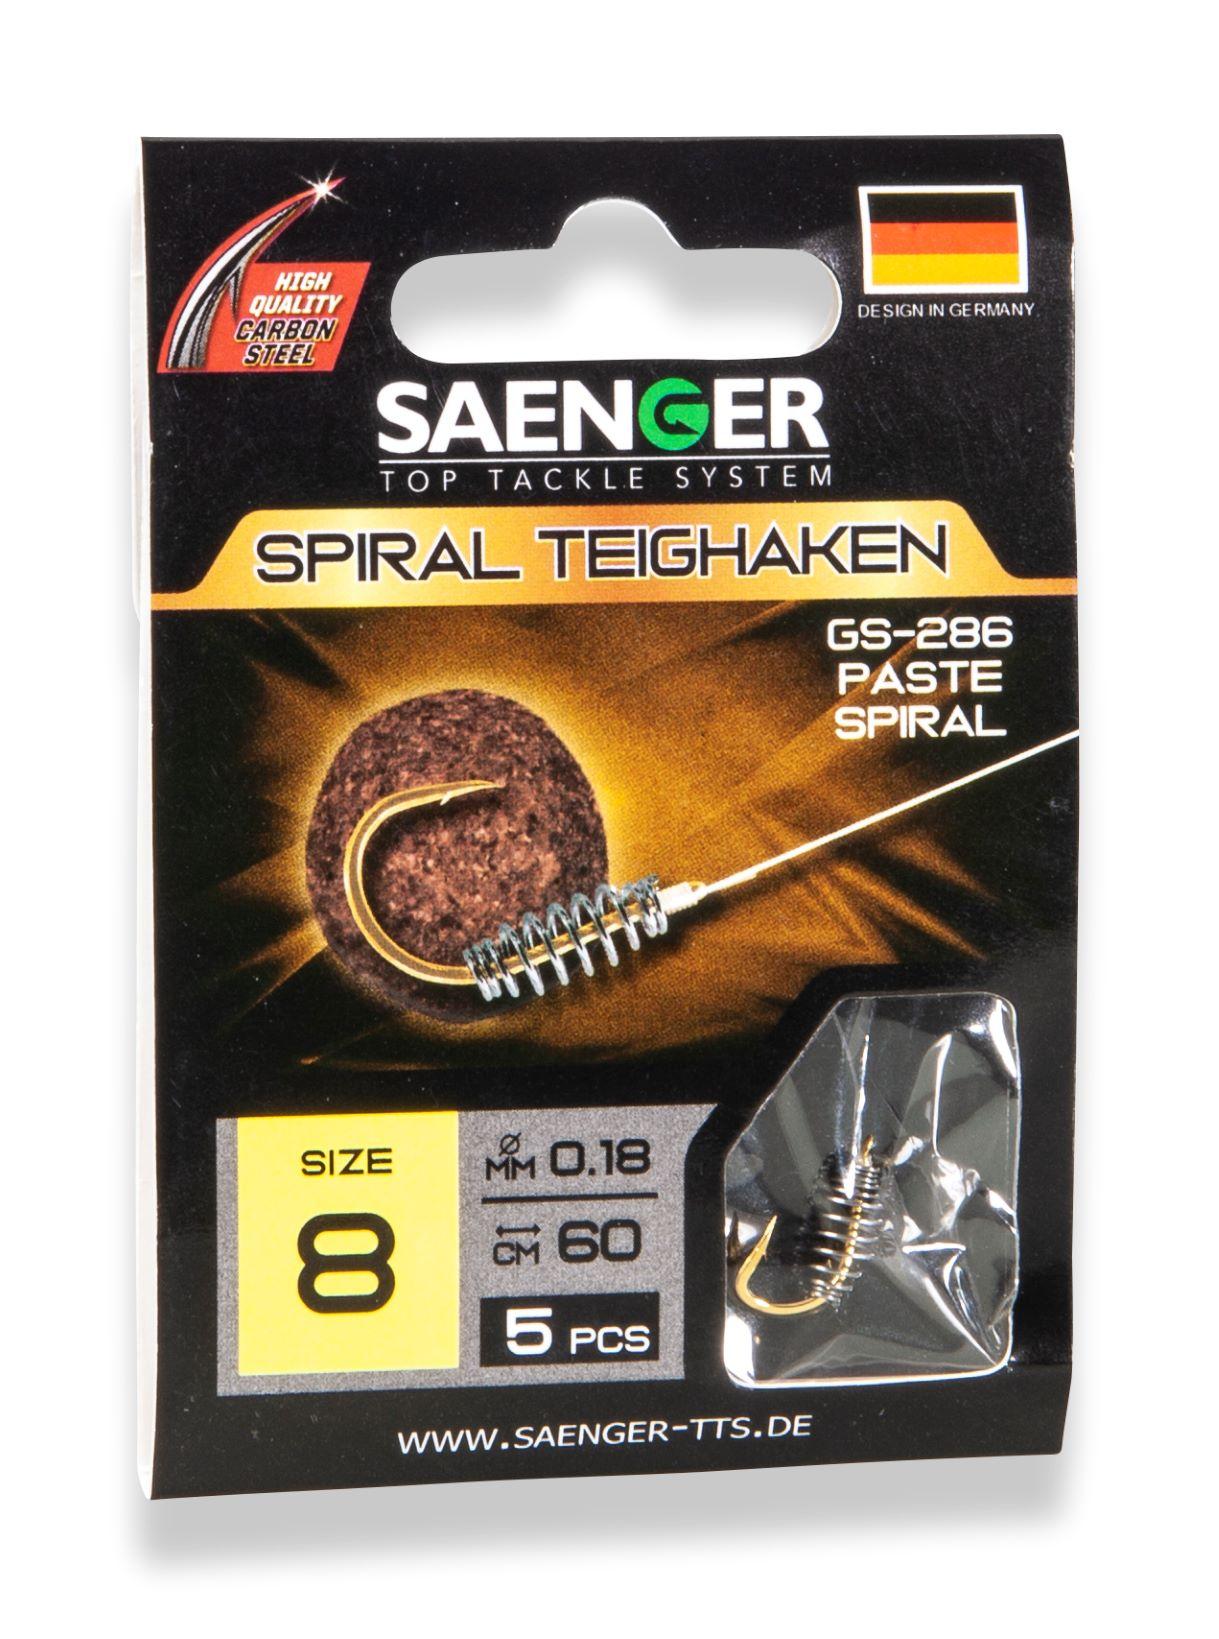 Saenger Návazec pro lov s těstem (háček se spirálou) Teighaken GS-286 vel. 4, 5 ks/bal